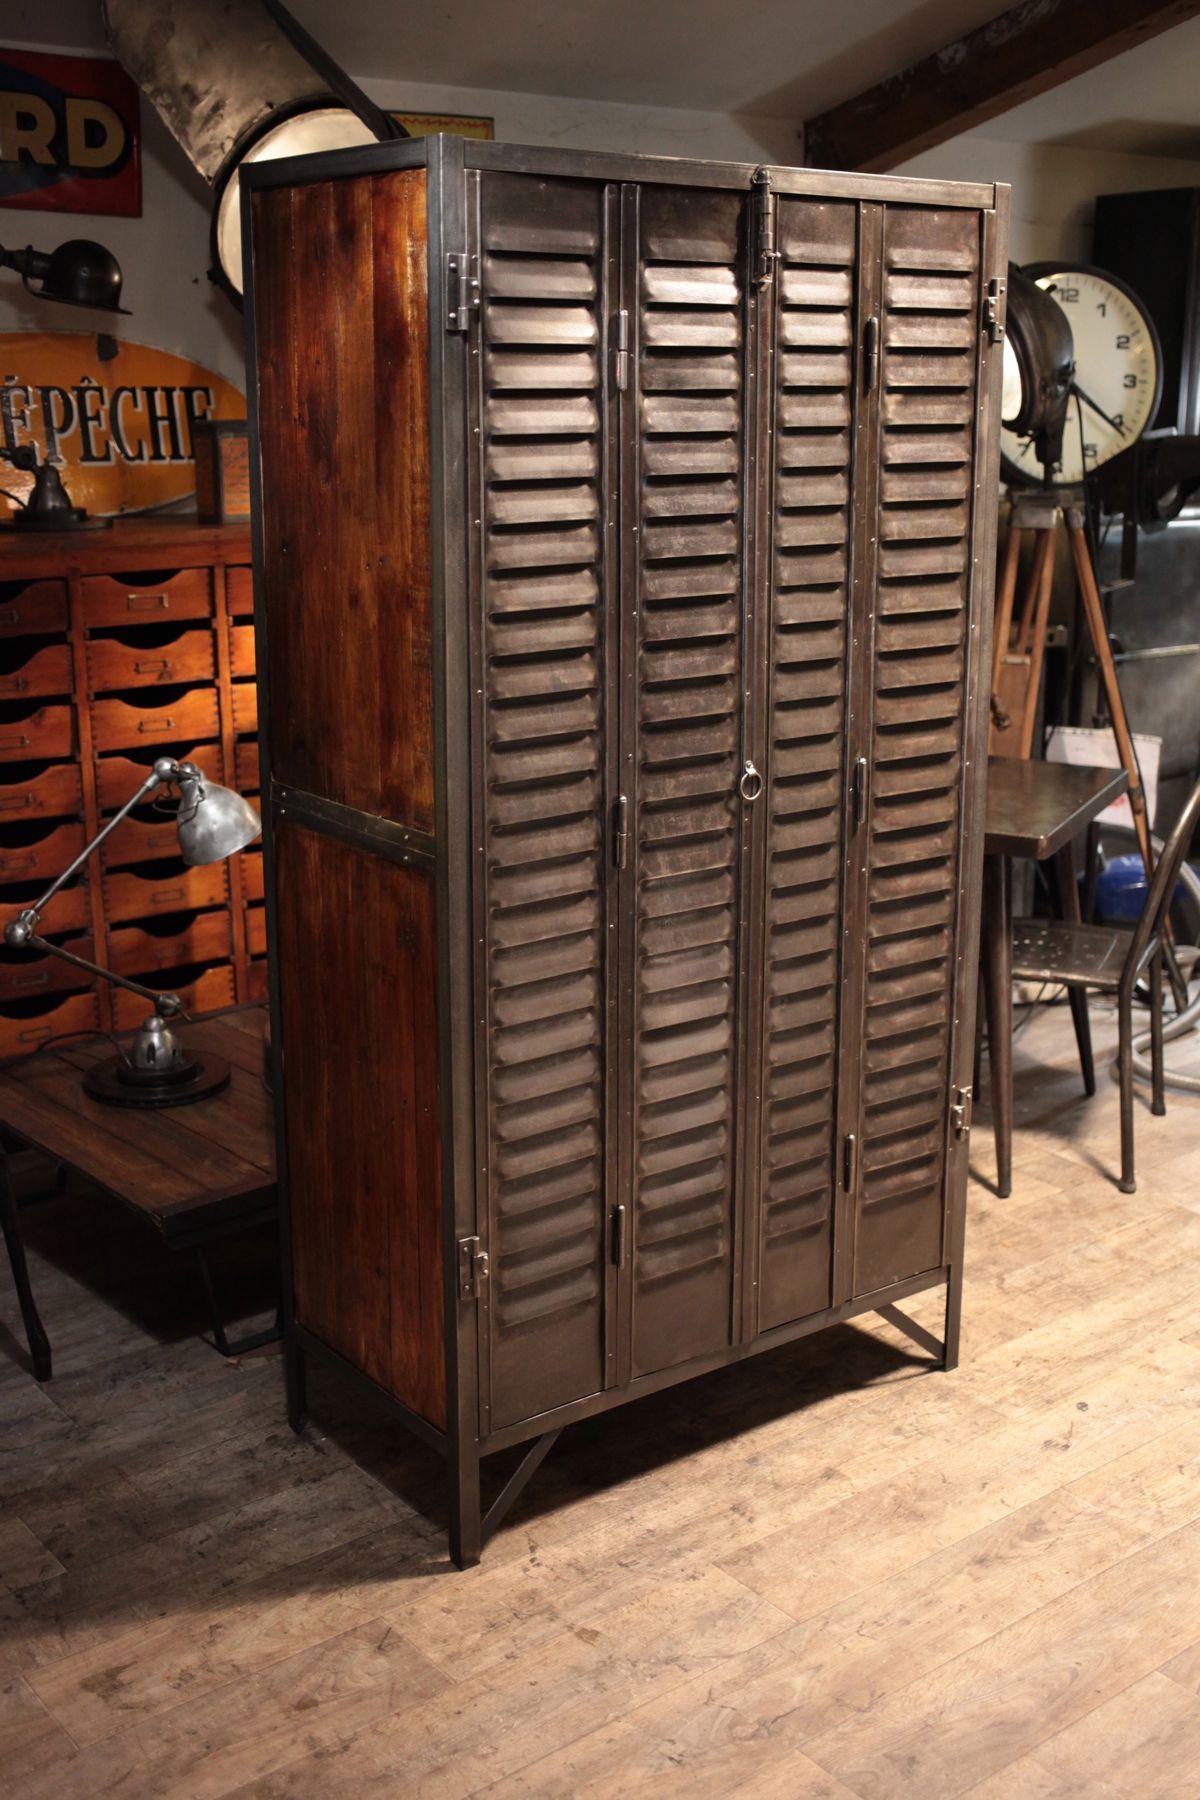 Anspruchsvoll Rustikale Möbel Referenz Von Renaud Jaylac Brocantes Antiquites Trielles Meuble De